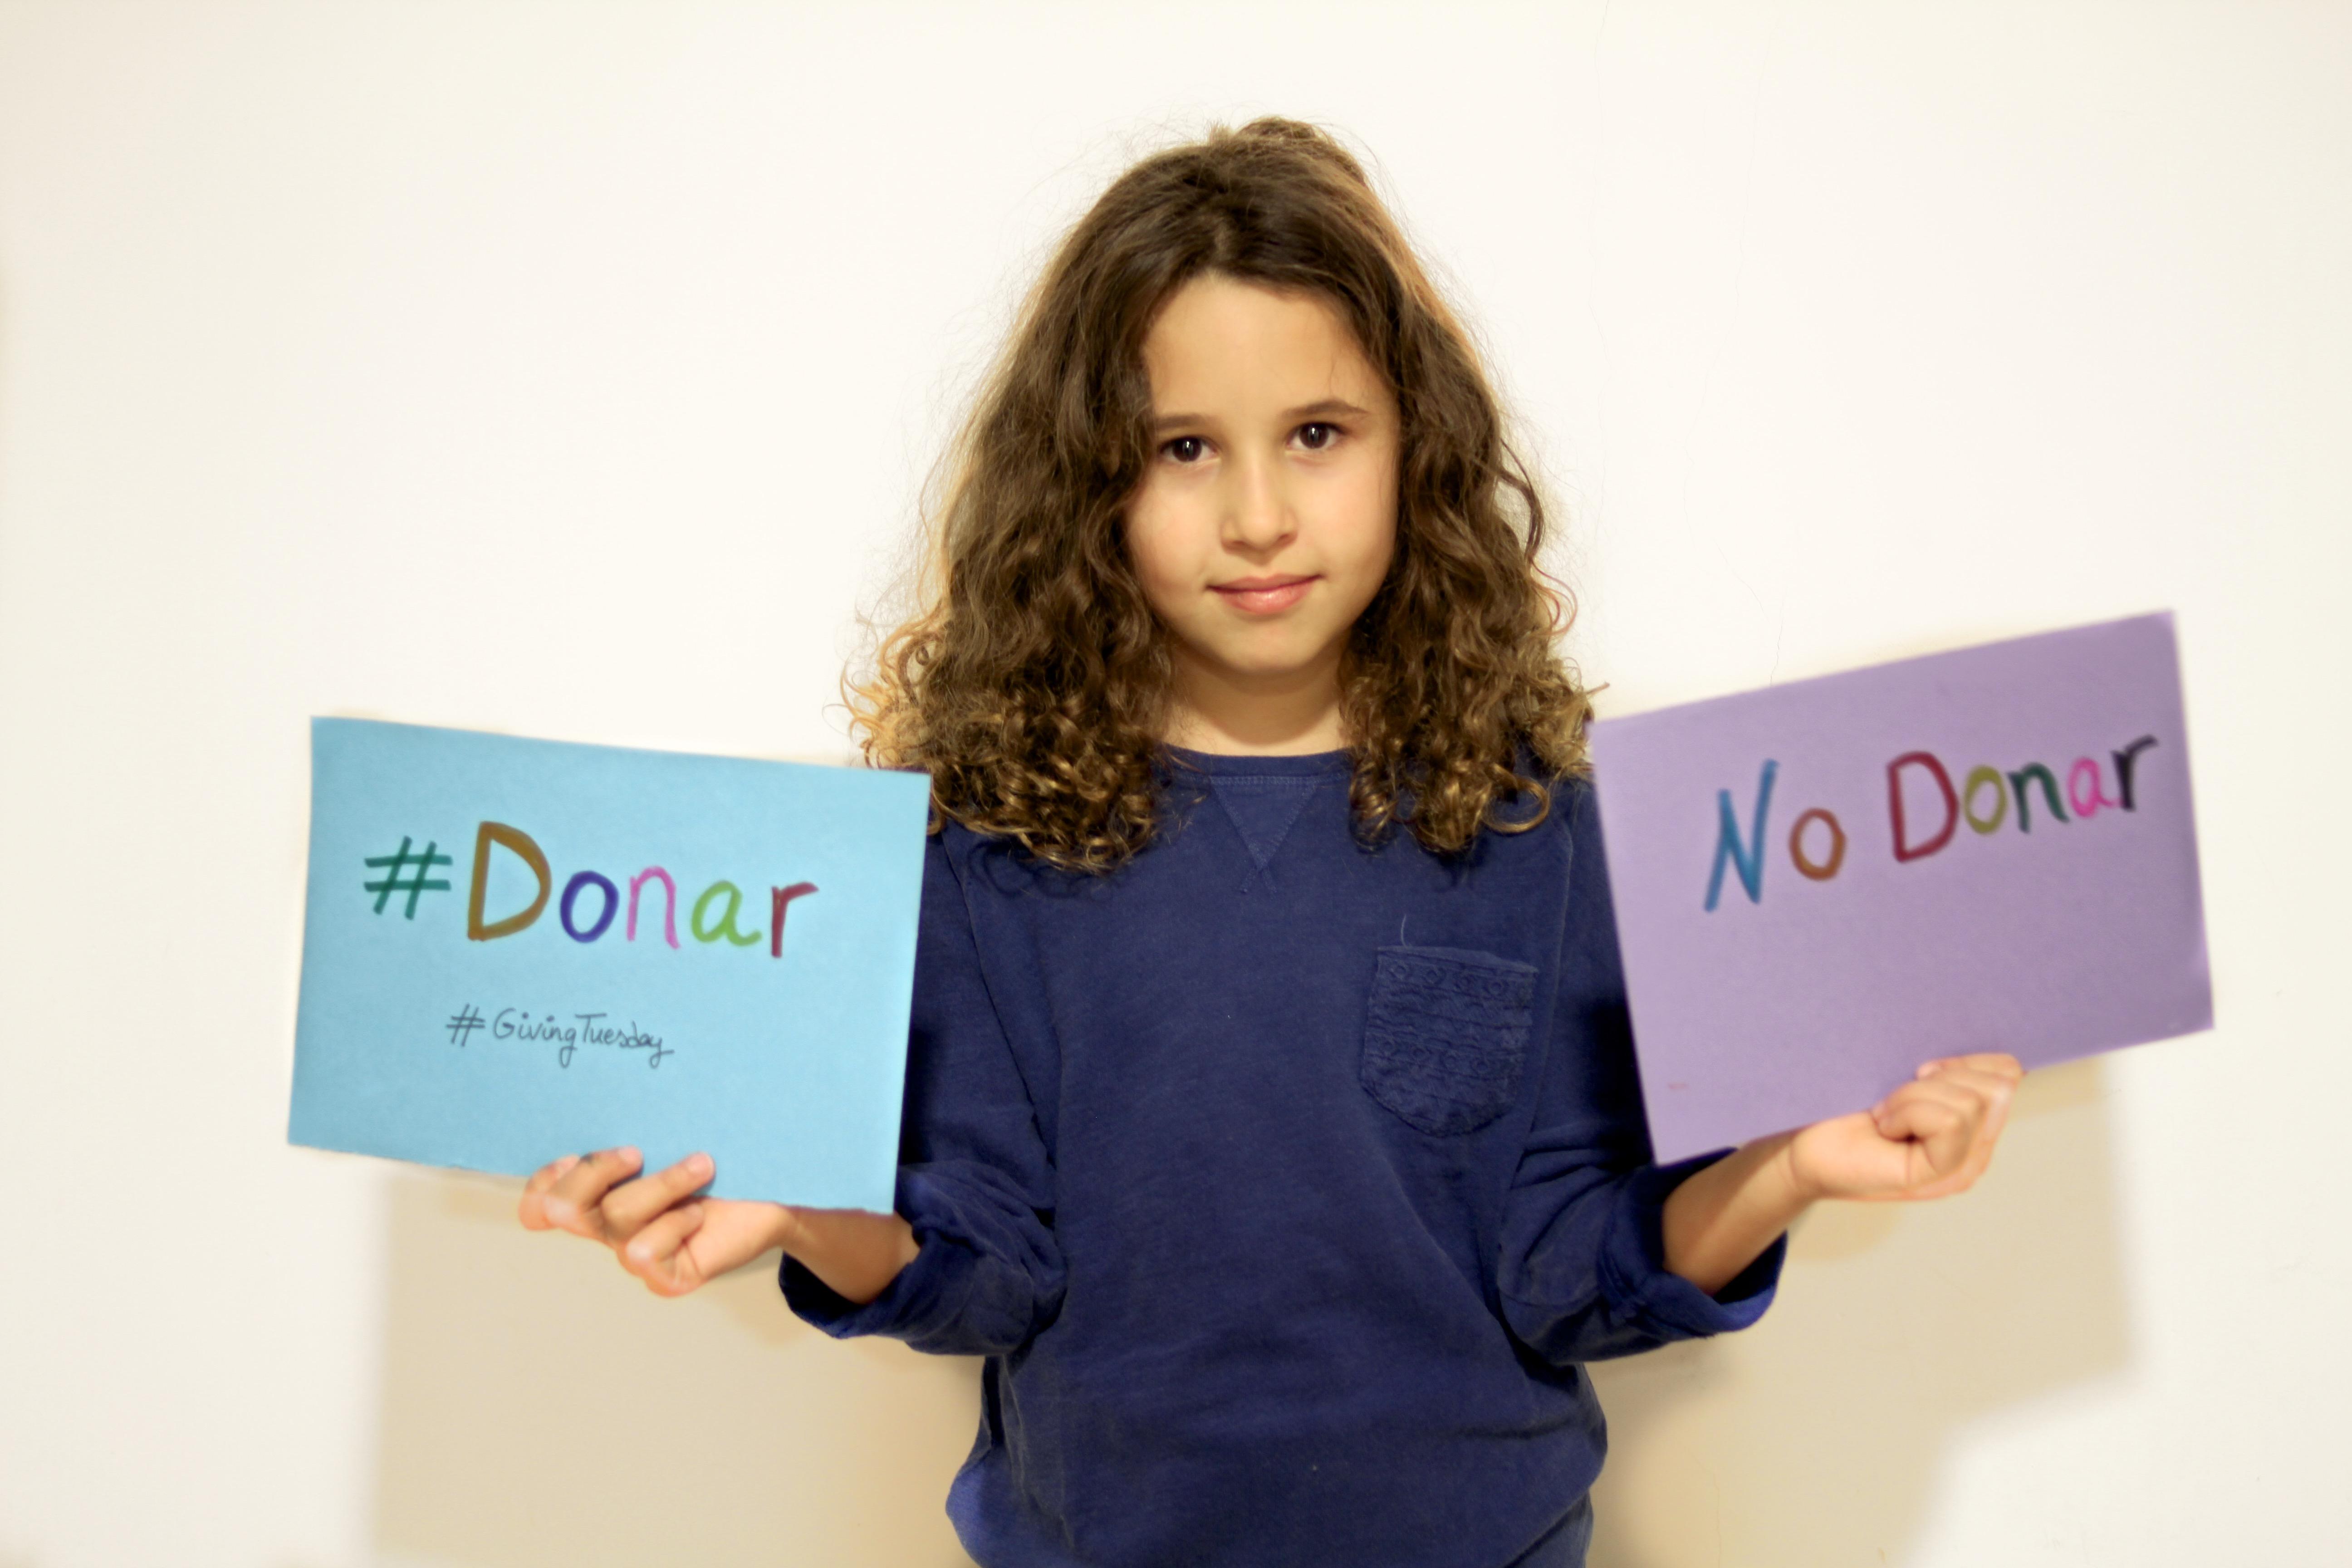 donativo- la caixa-donar-obra-social-lacaixa-descalzaporelparque-blogger-kids-solidaridad-givingtuesday